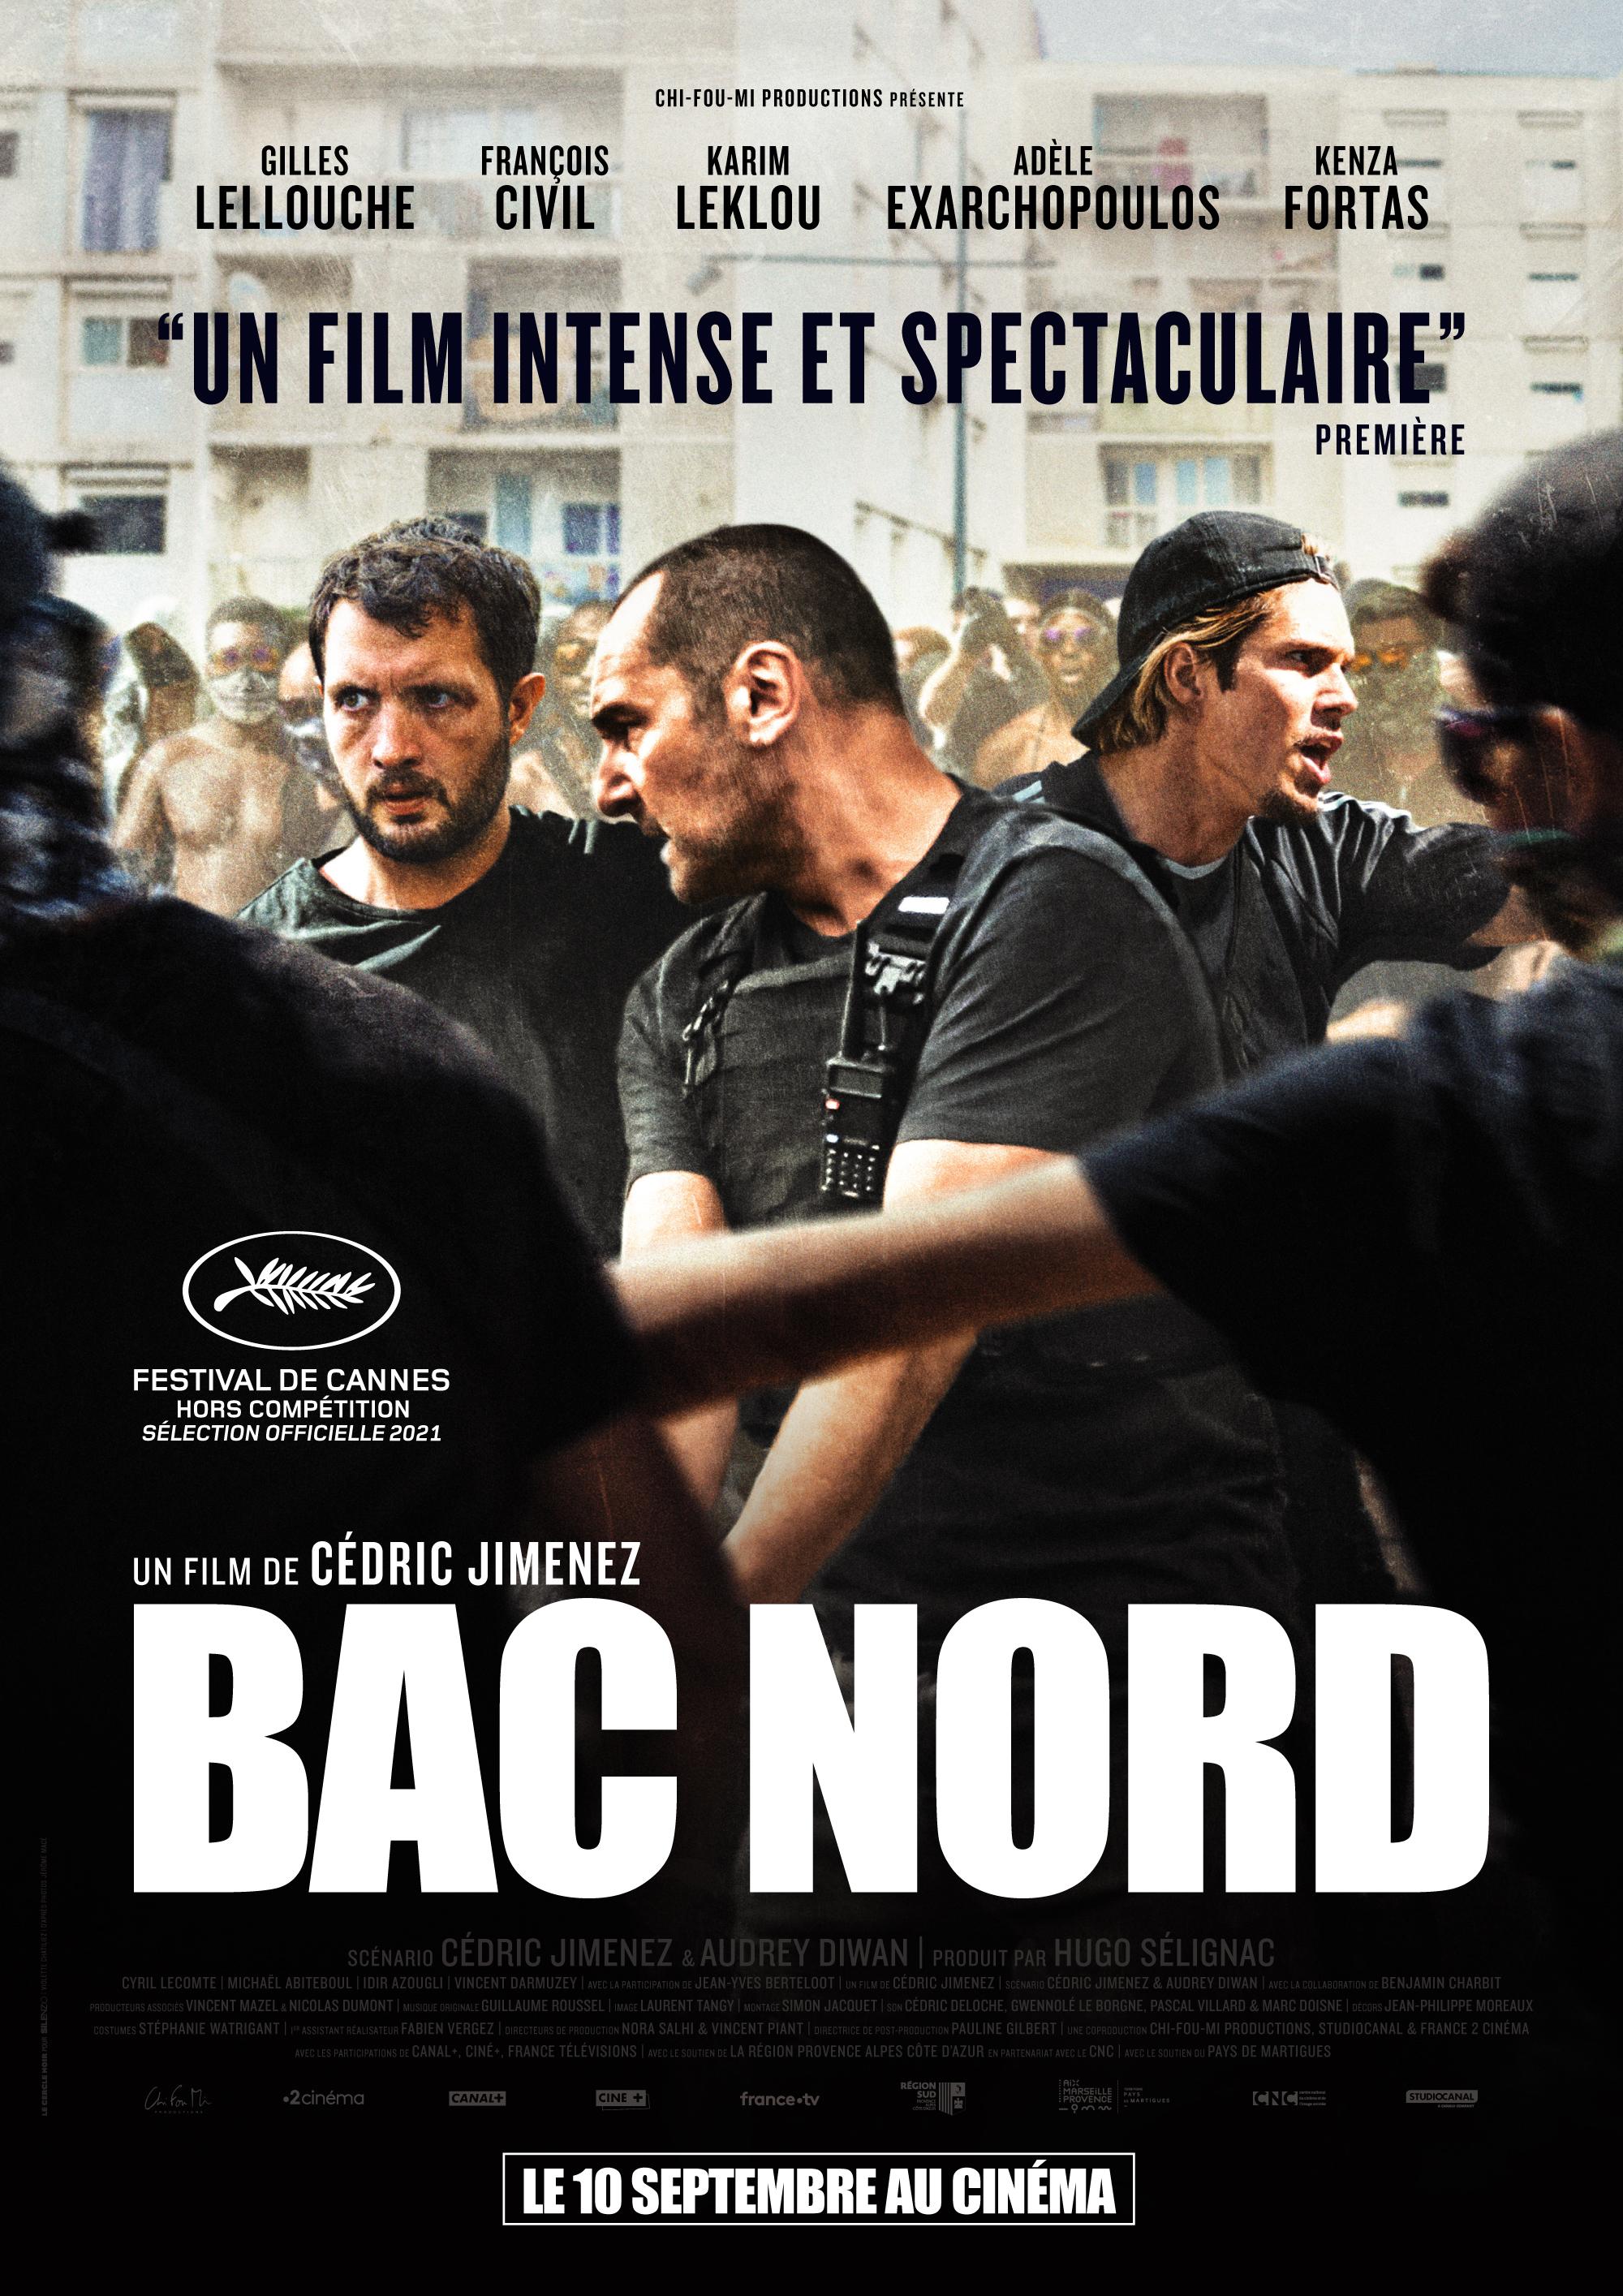 BAC-NORD_IMPRESSION_A3_A4_3SEPTEMBRE_HD